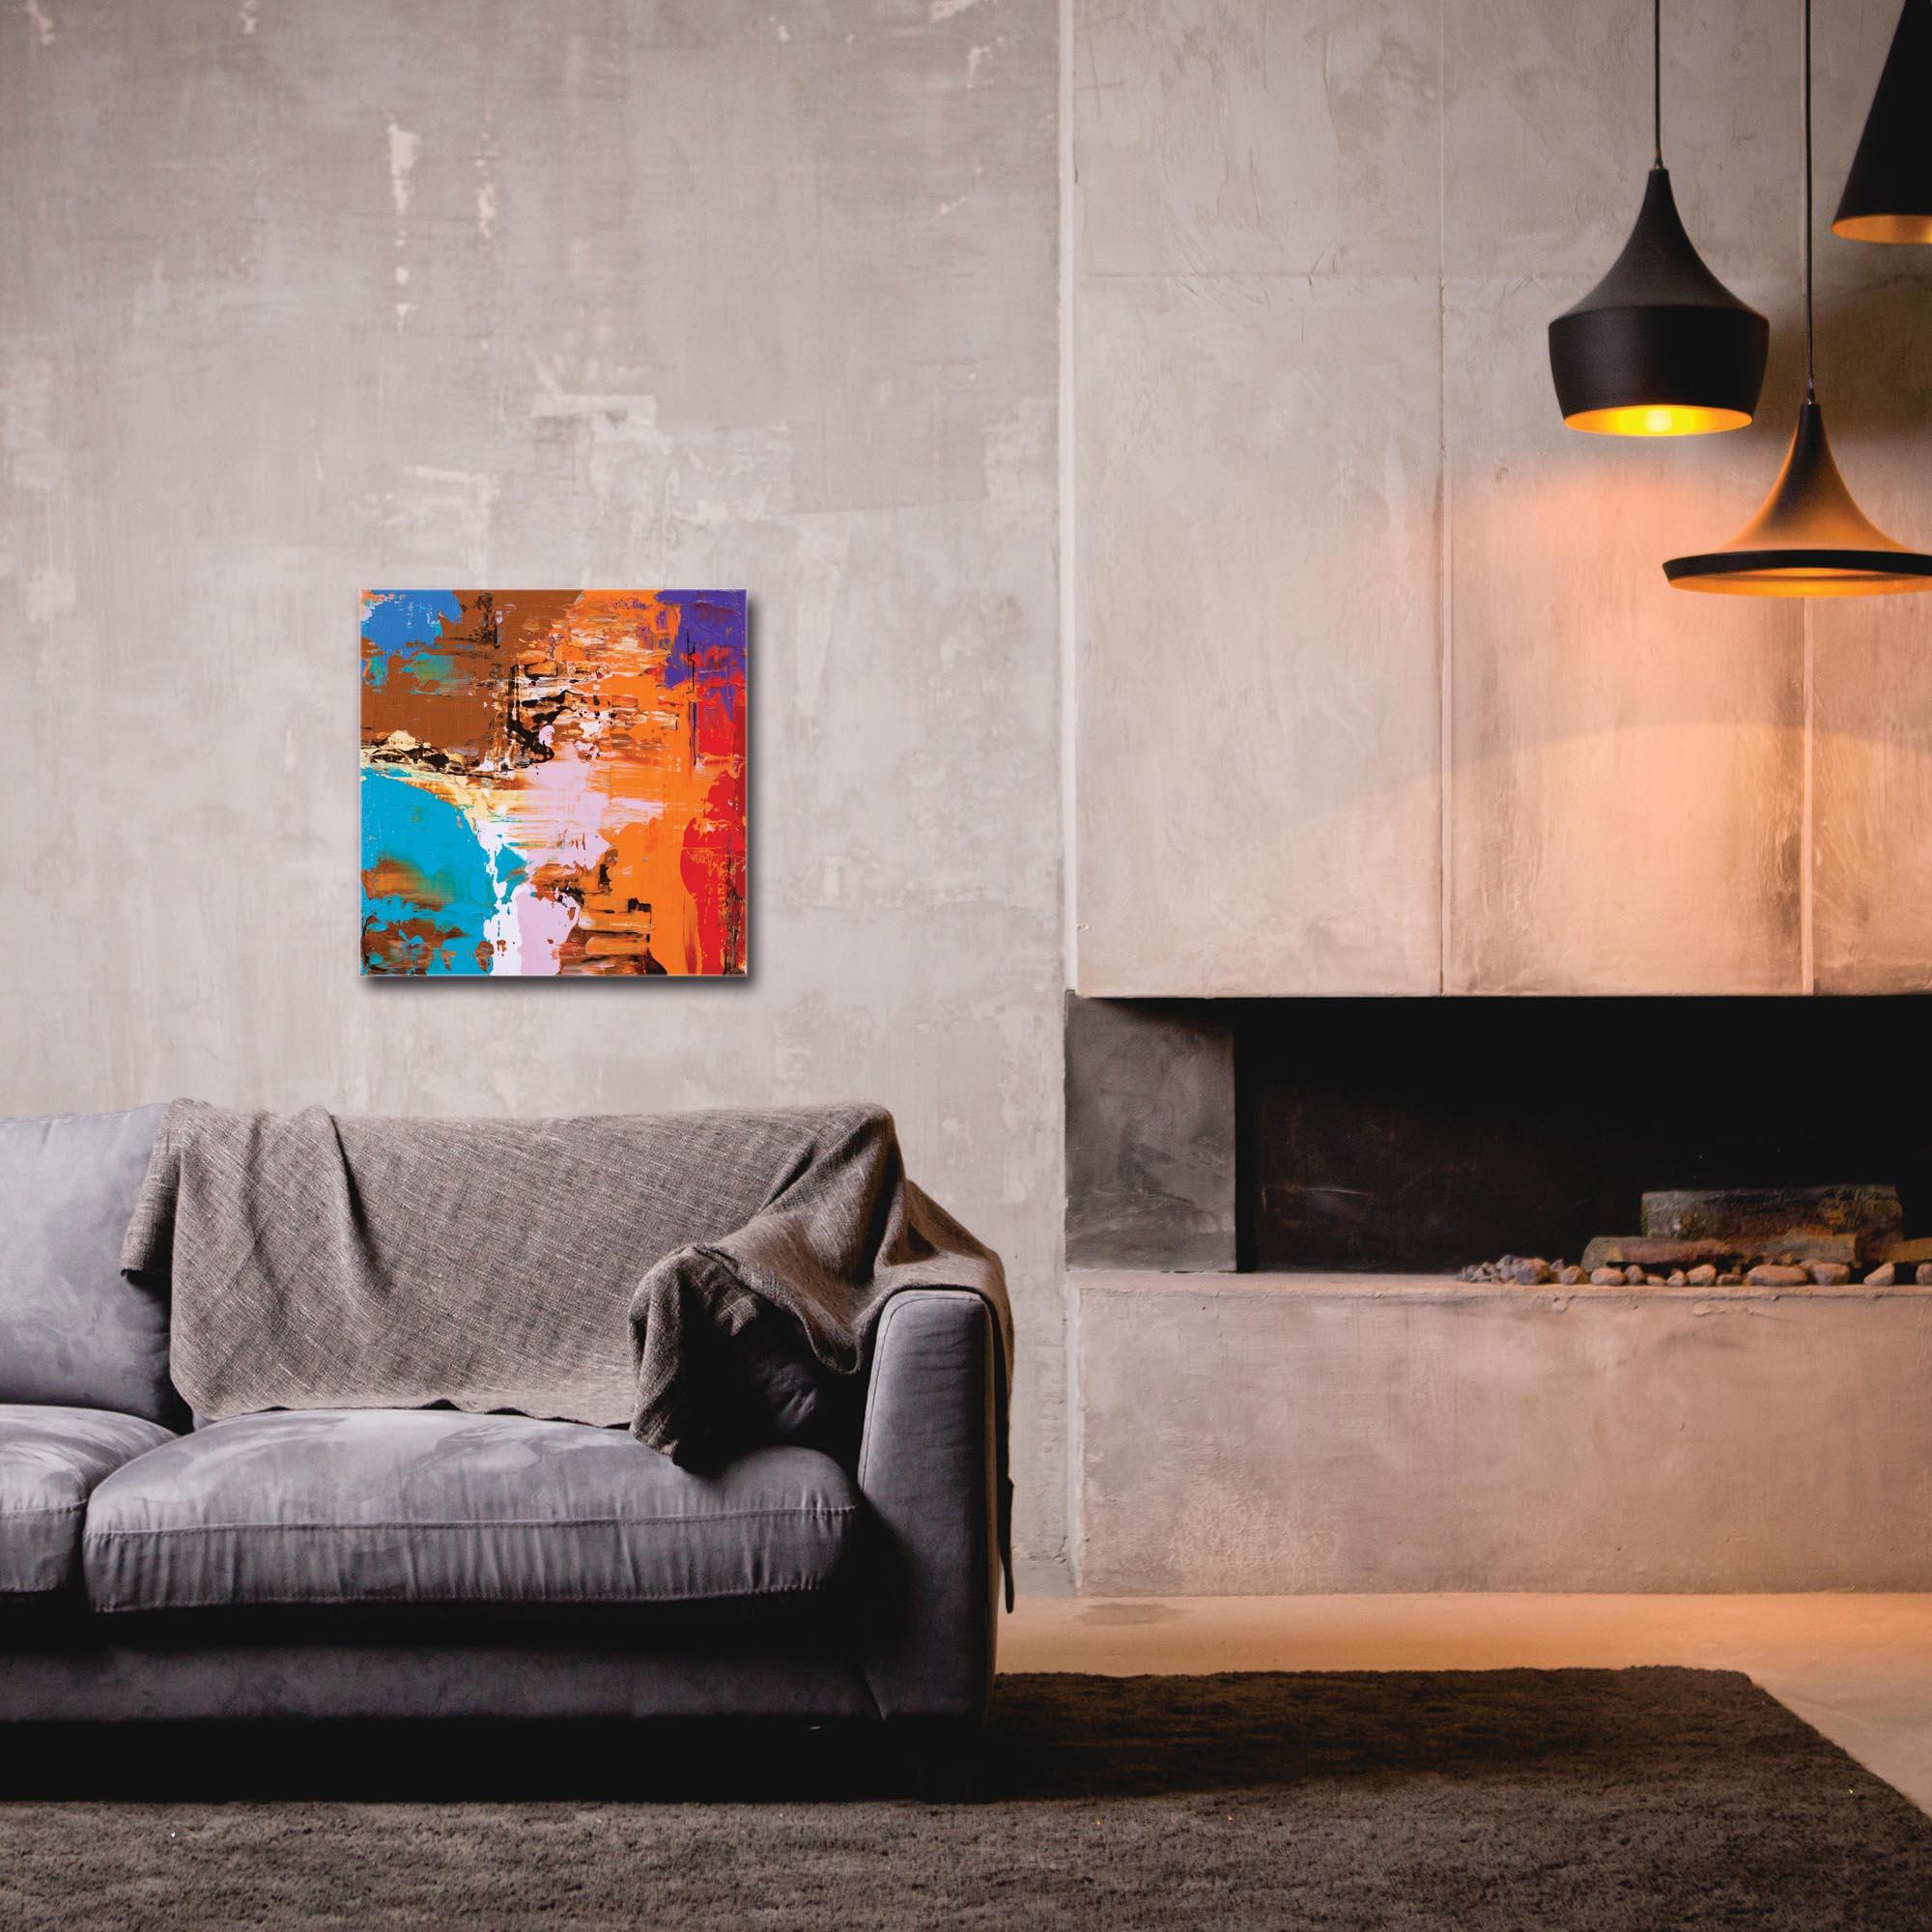 Abstract Wall Art 'Urban Life 14' - Urban Decor on Metal or Plexiglass - Image 3